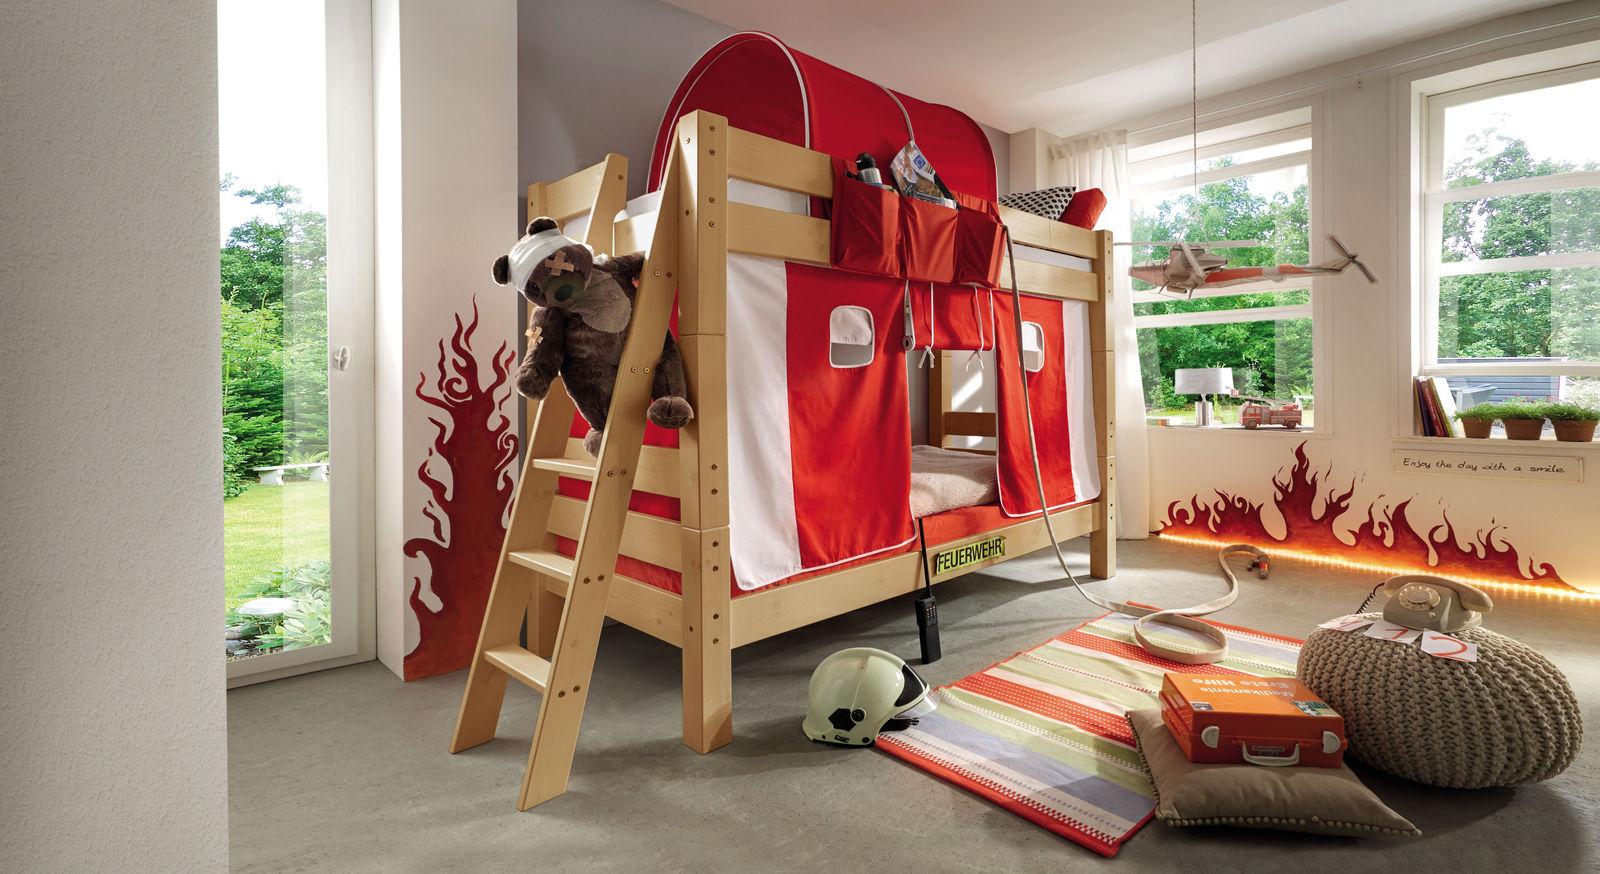 Stabiles Stockbett Kids Dreams  in gelaugt/geölt